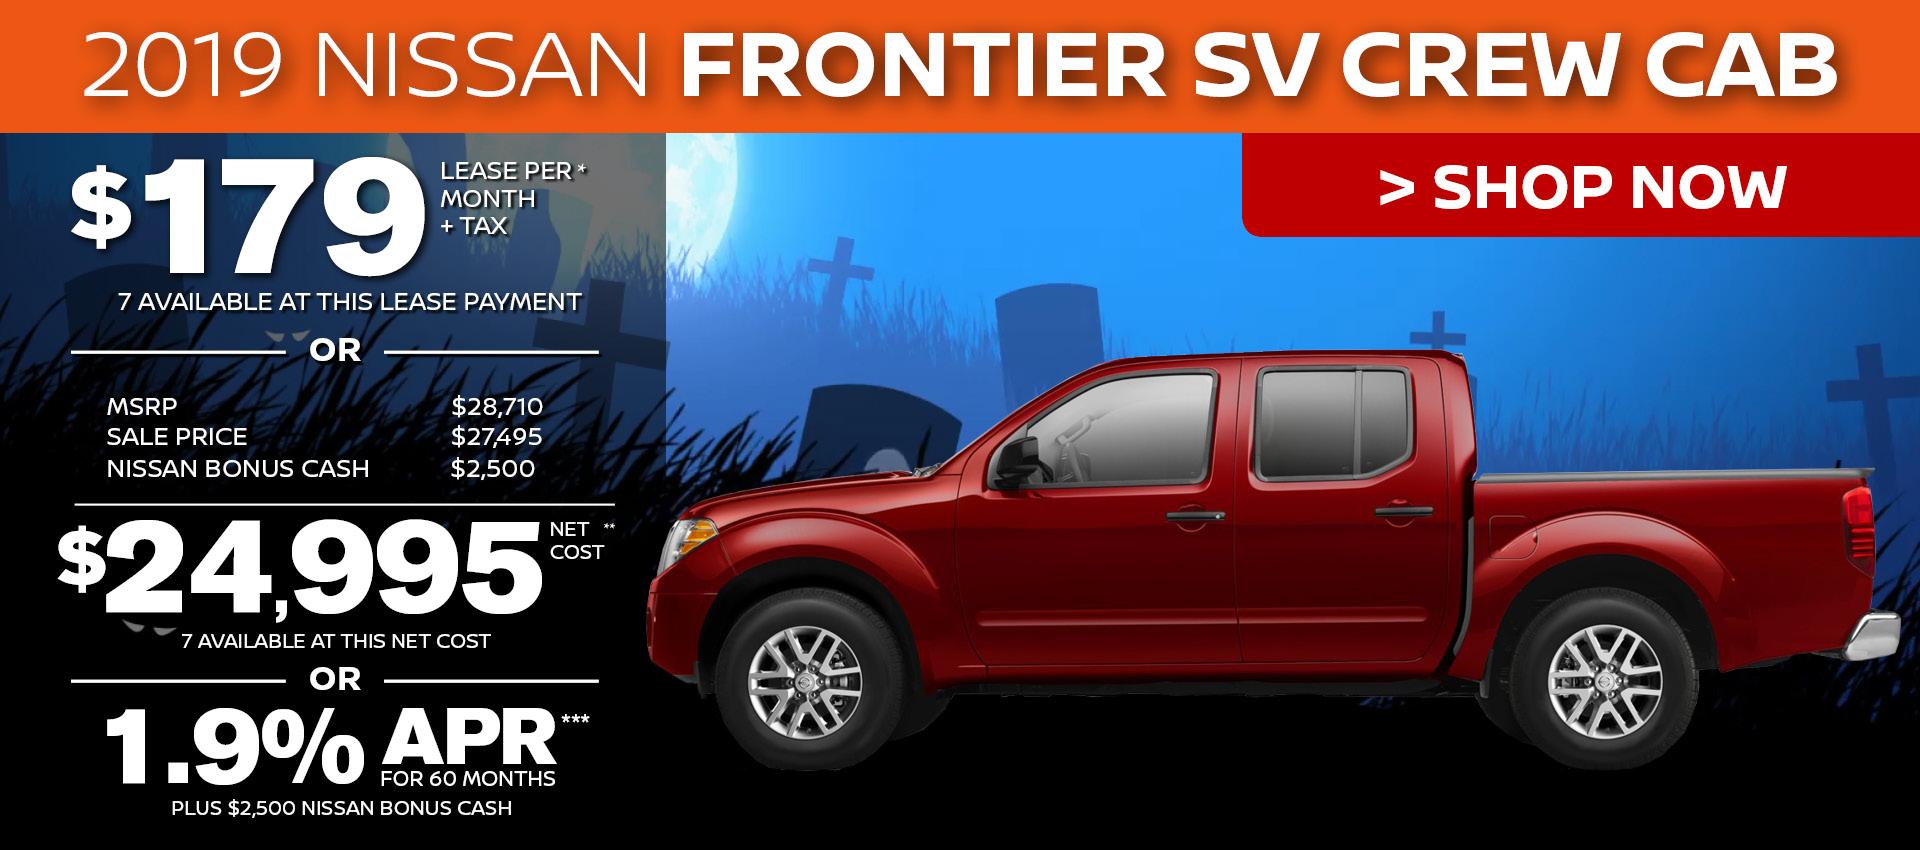 Mossy Nissan - Nissan Frontier SV Crew HP